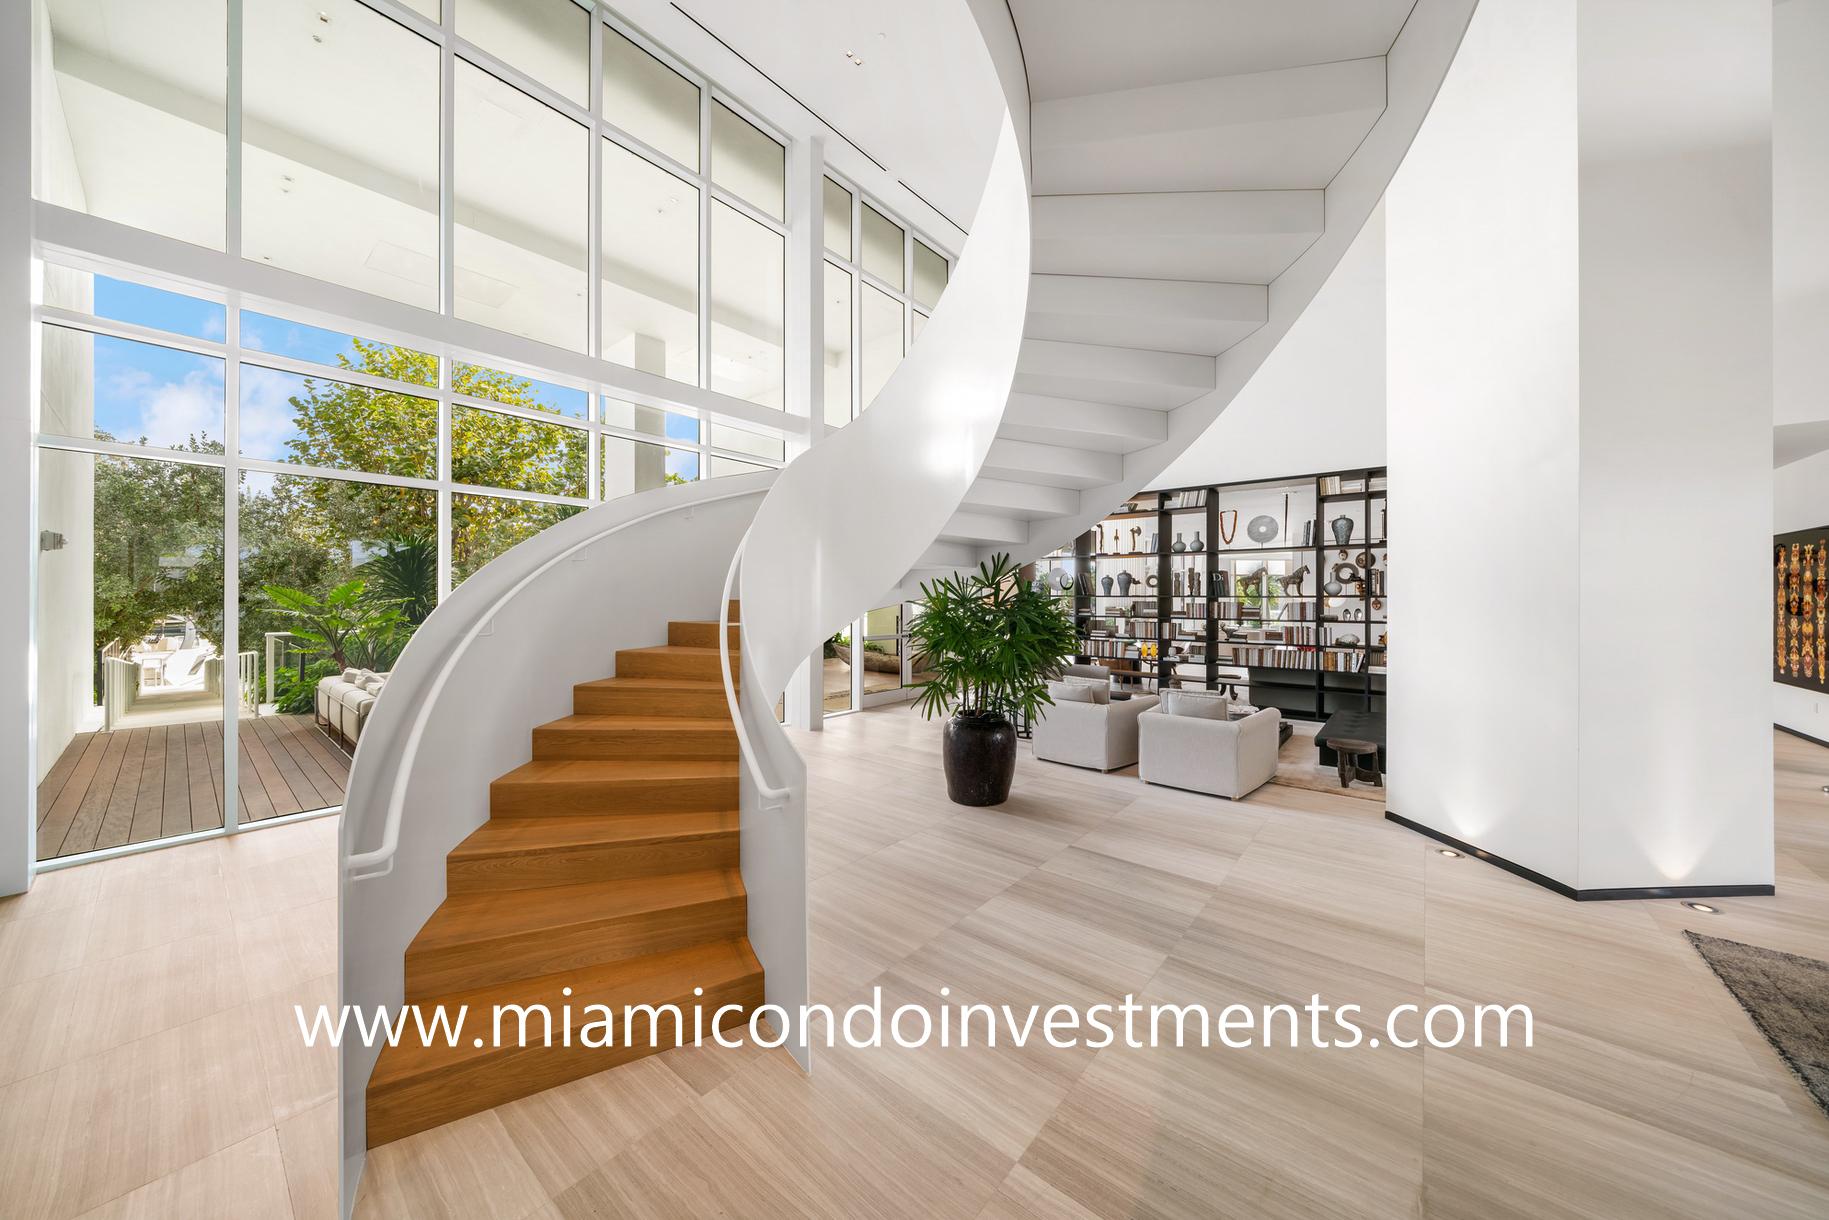 Ritz-Carlton Residences spiral staircase